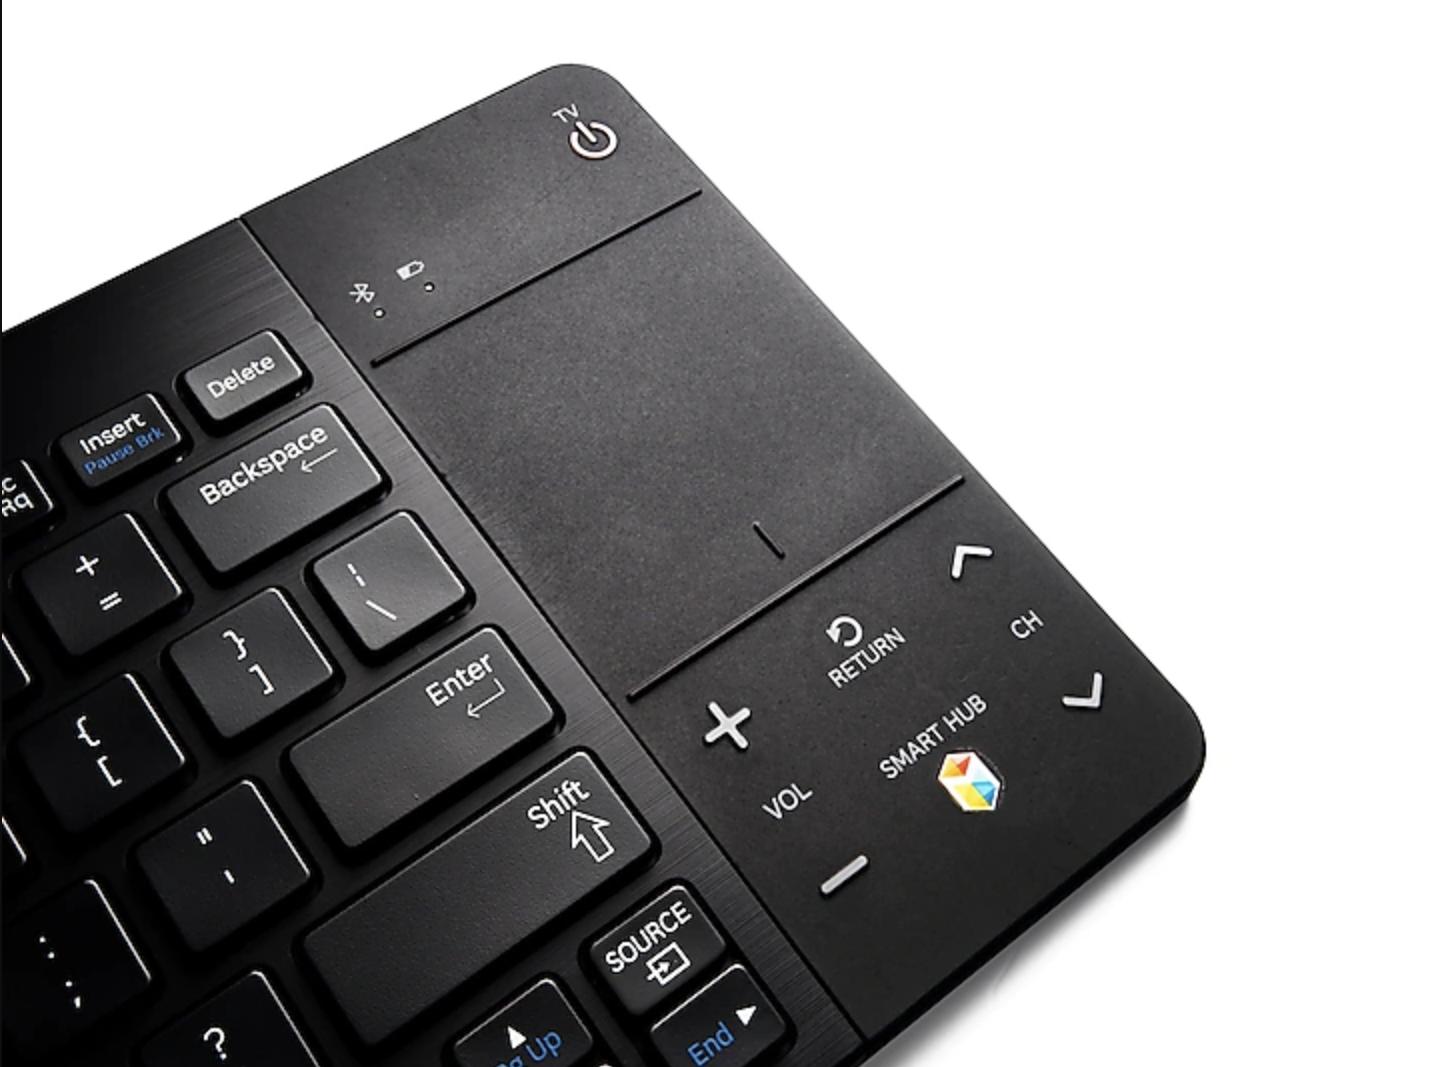 Teclado Samsung Wireless para Smart TV VG-KBD1000